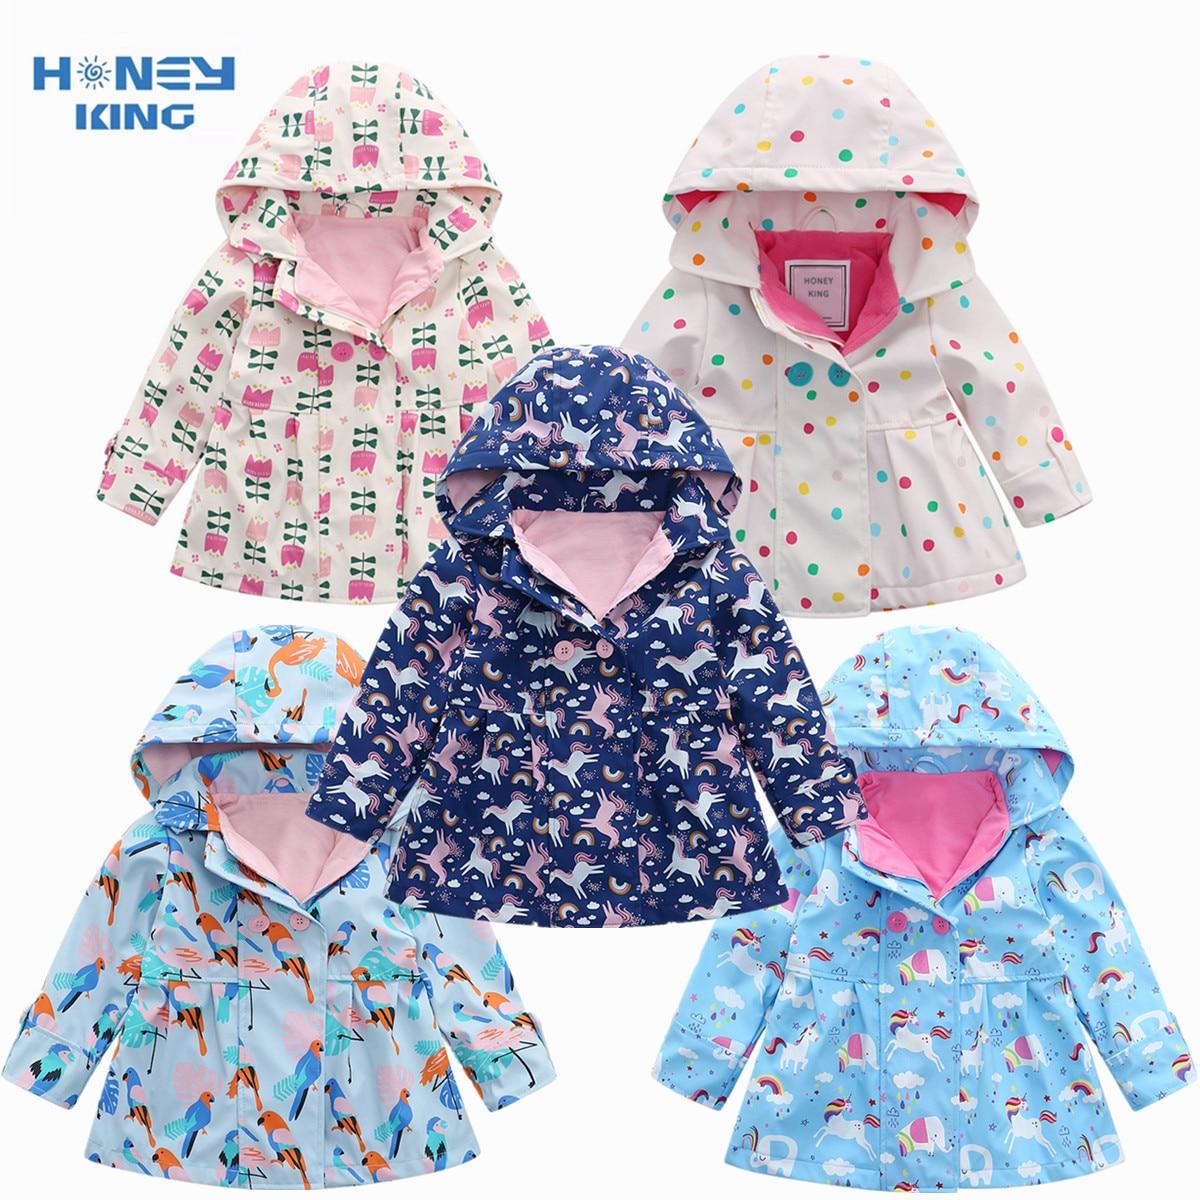 AliExpress - HONEYKING PU Waterproof Coat For Girl Baby Trench Coat Kids Baby Girls Jacket Infant Child Fleece Jacket Hooded Outerwear